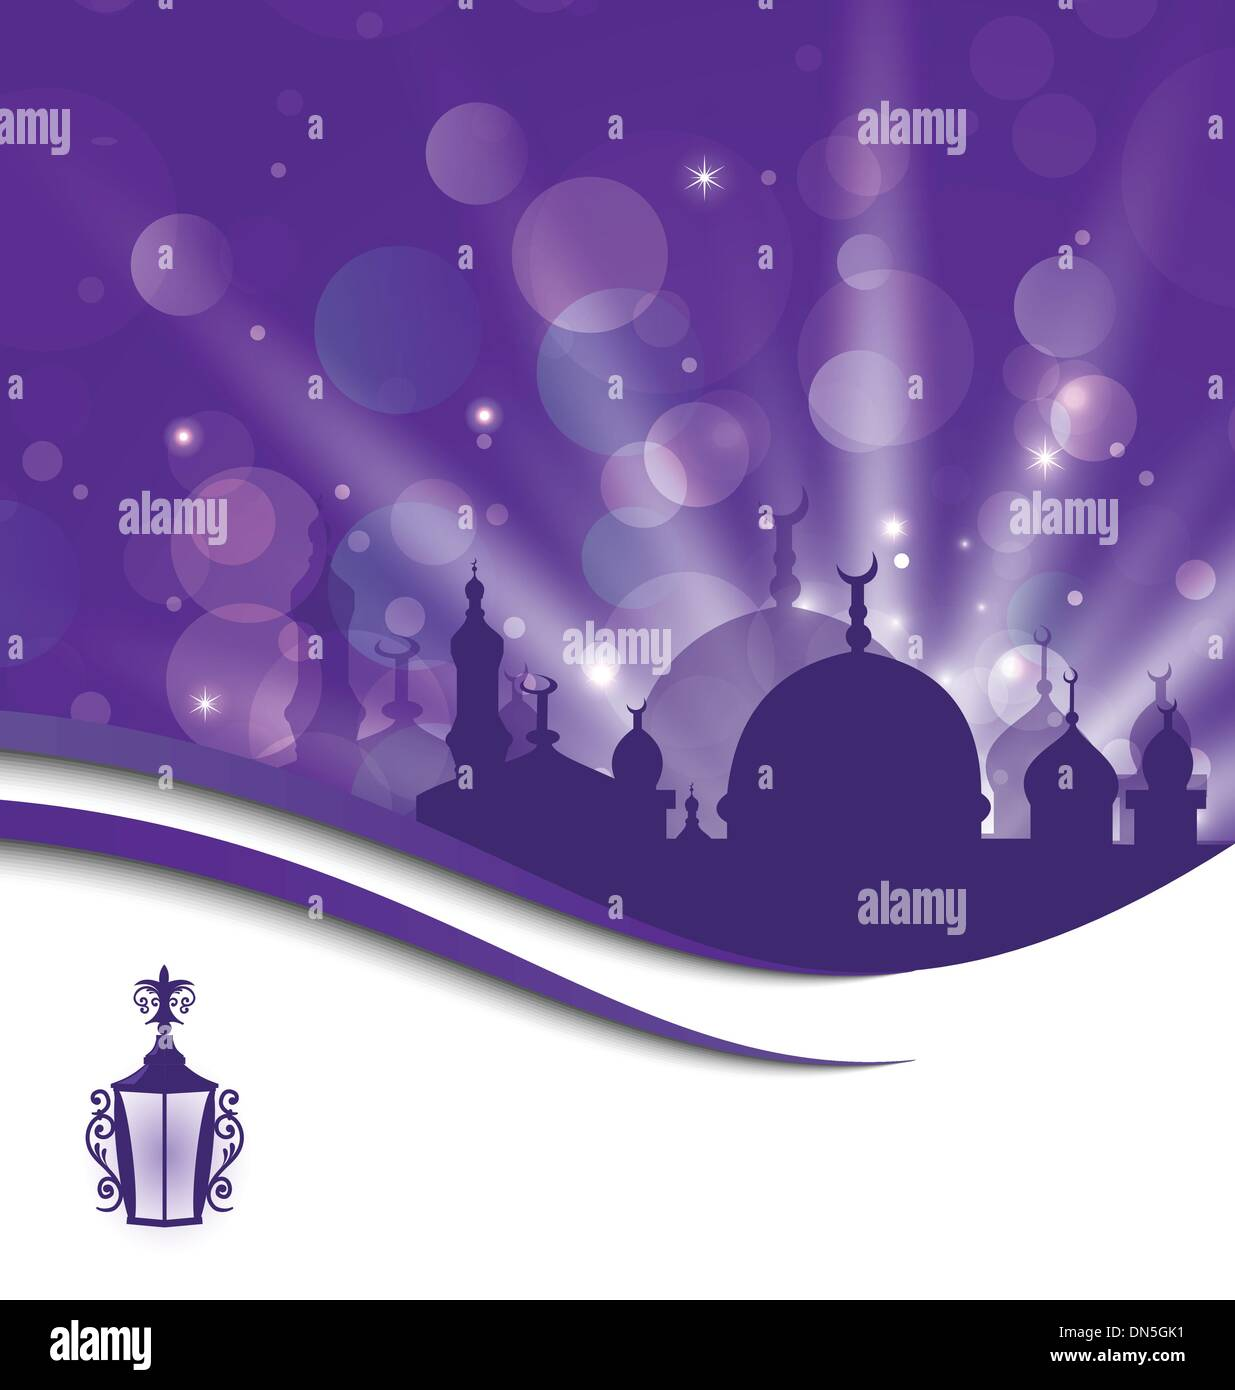 Greeting Card Template For Ramadan Kareem Stock Vector Art